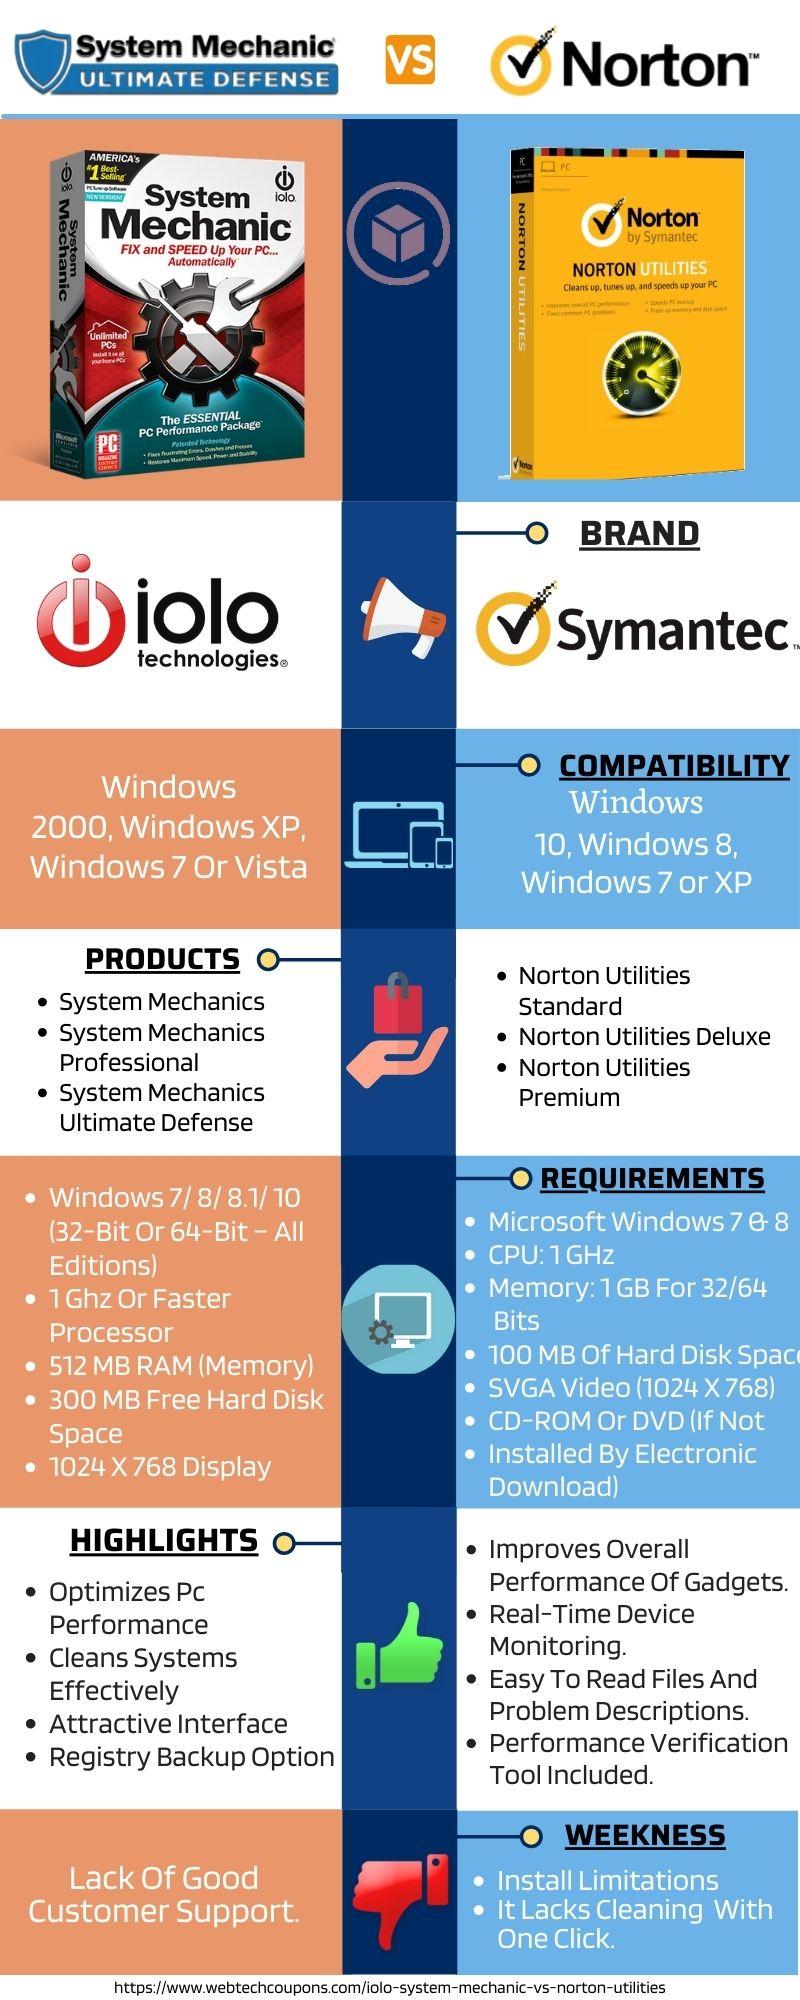 Iolo System Mechanics vs Norton Utilities Overview